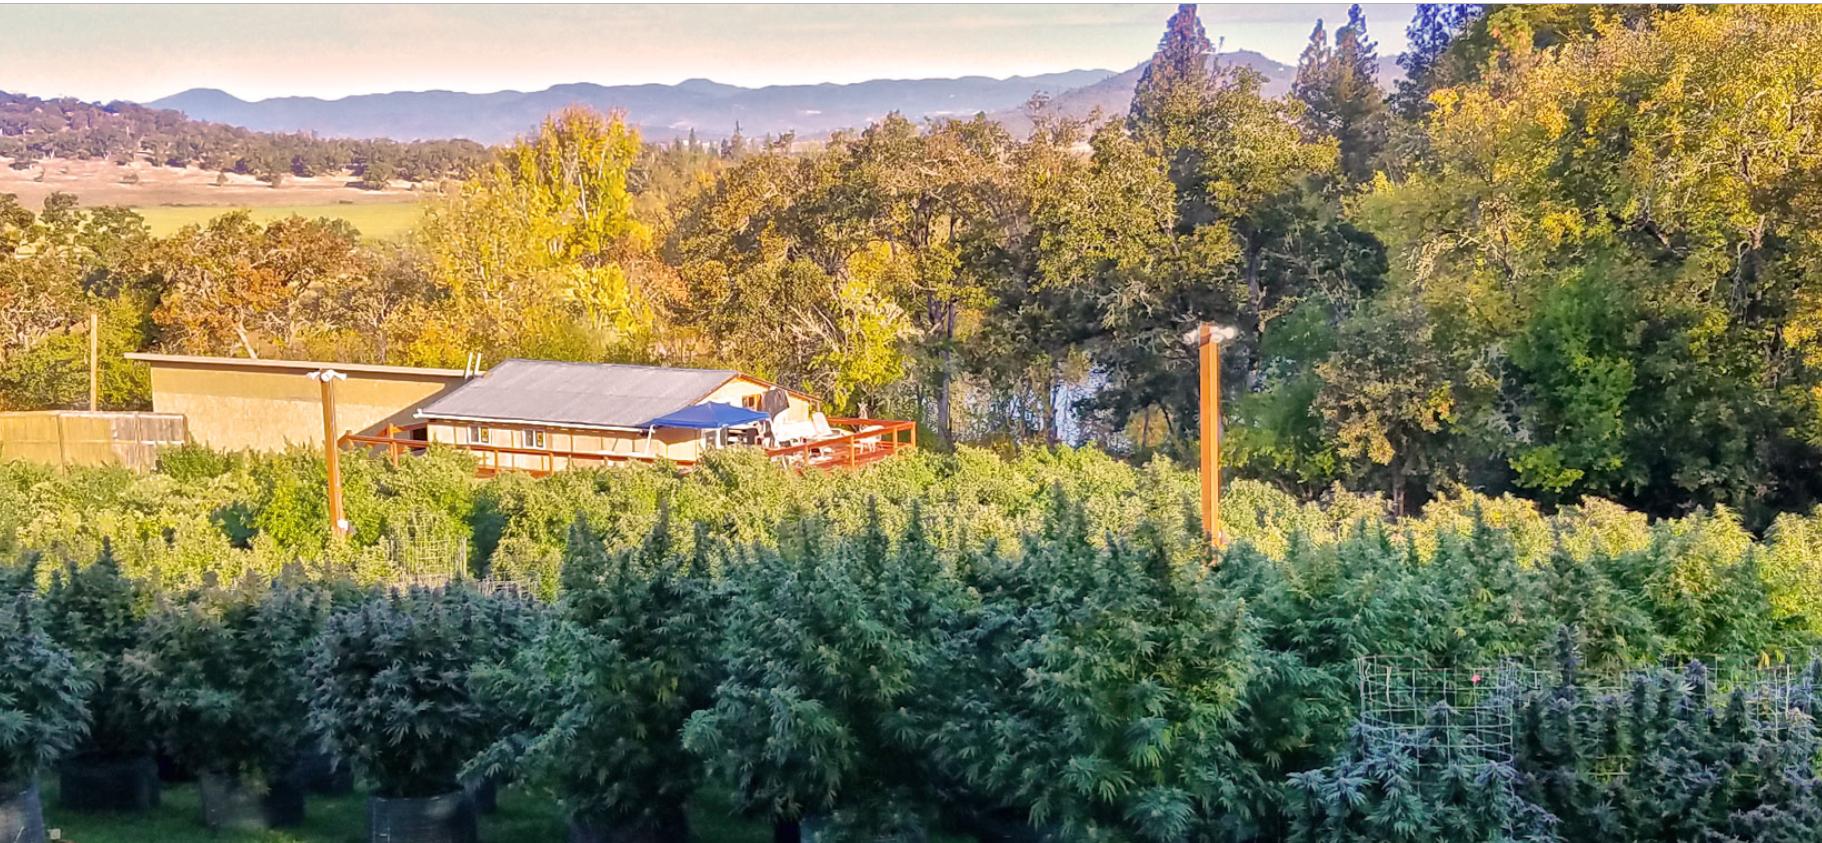 Oregon Cannabis Farms